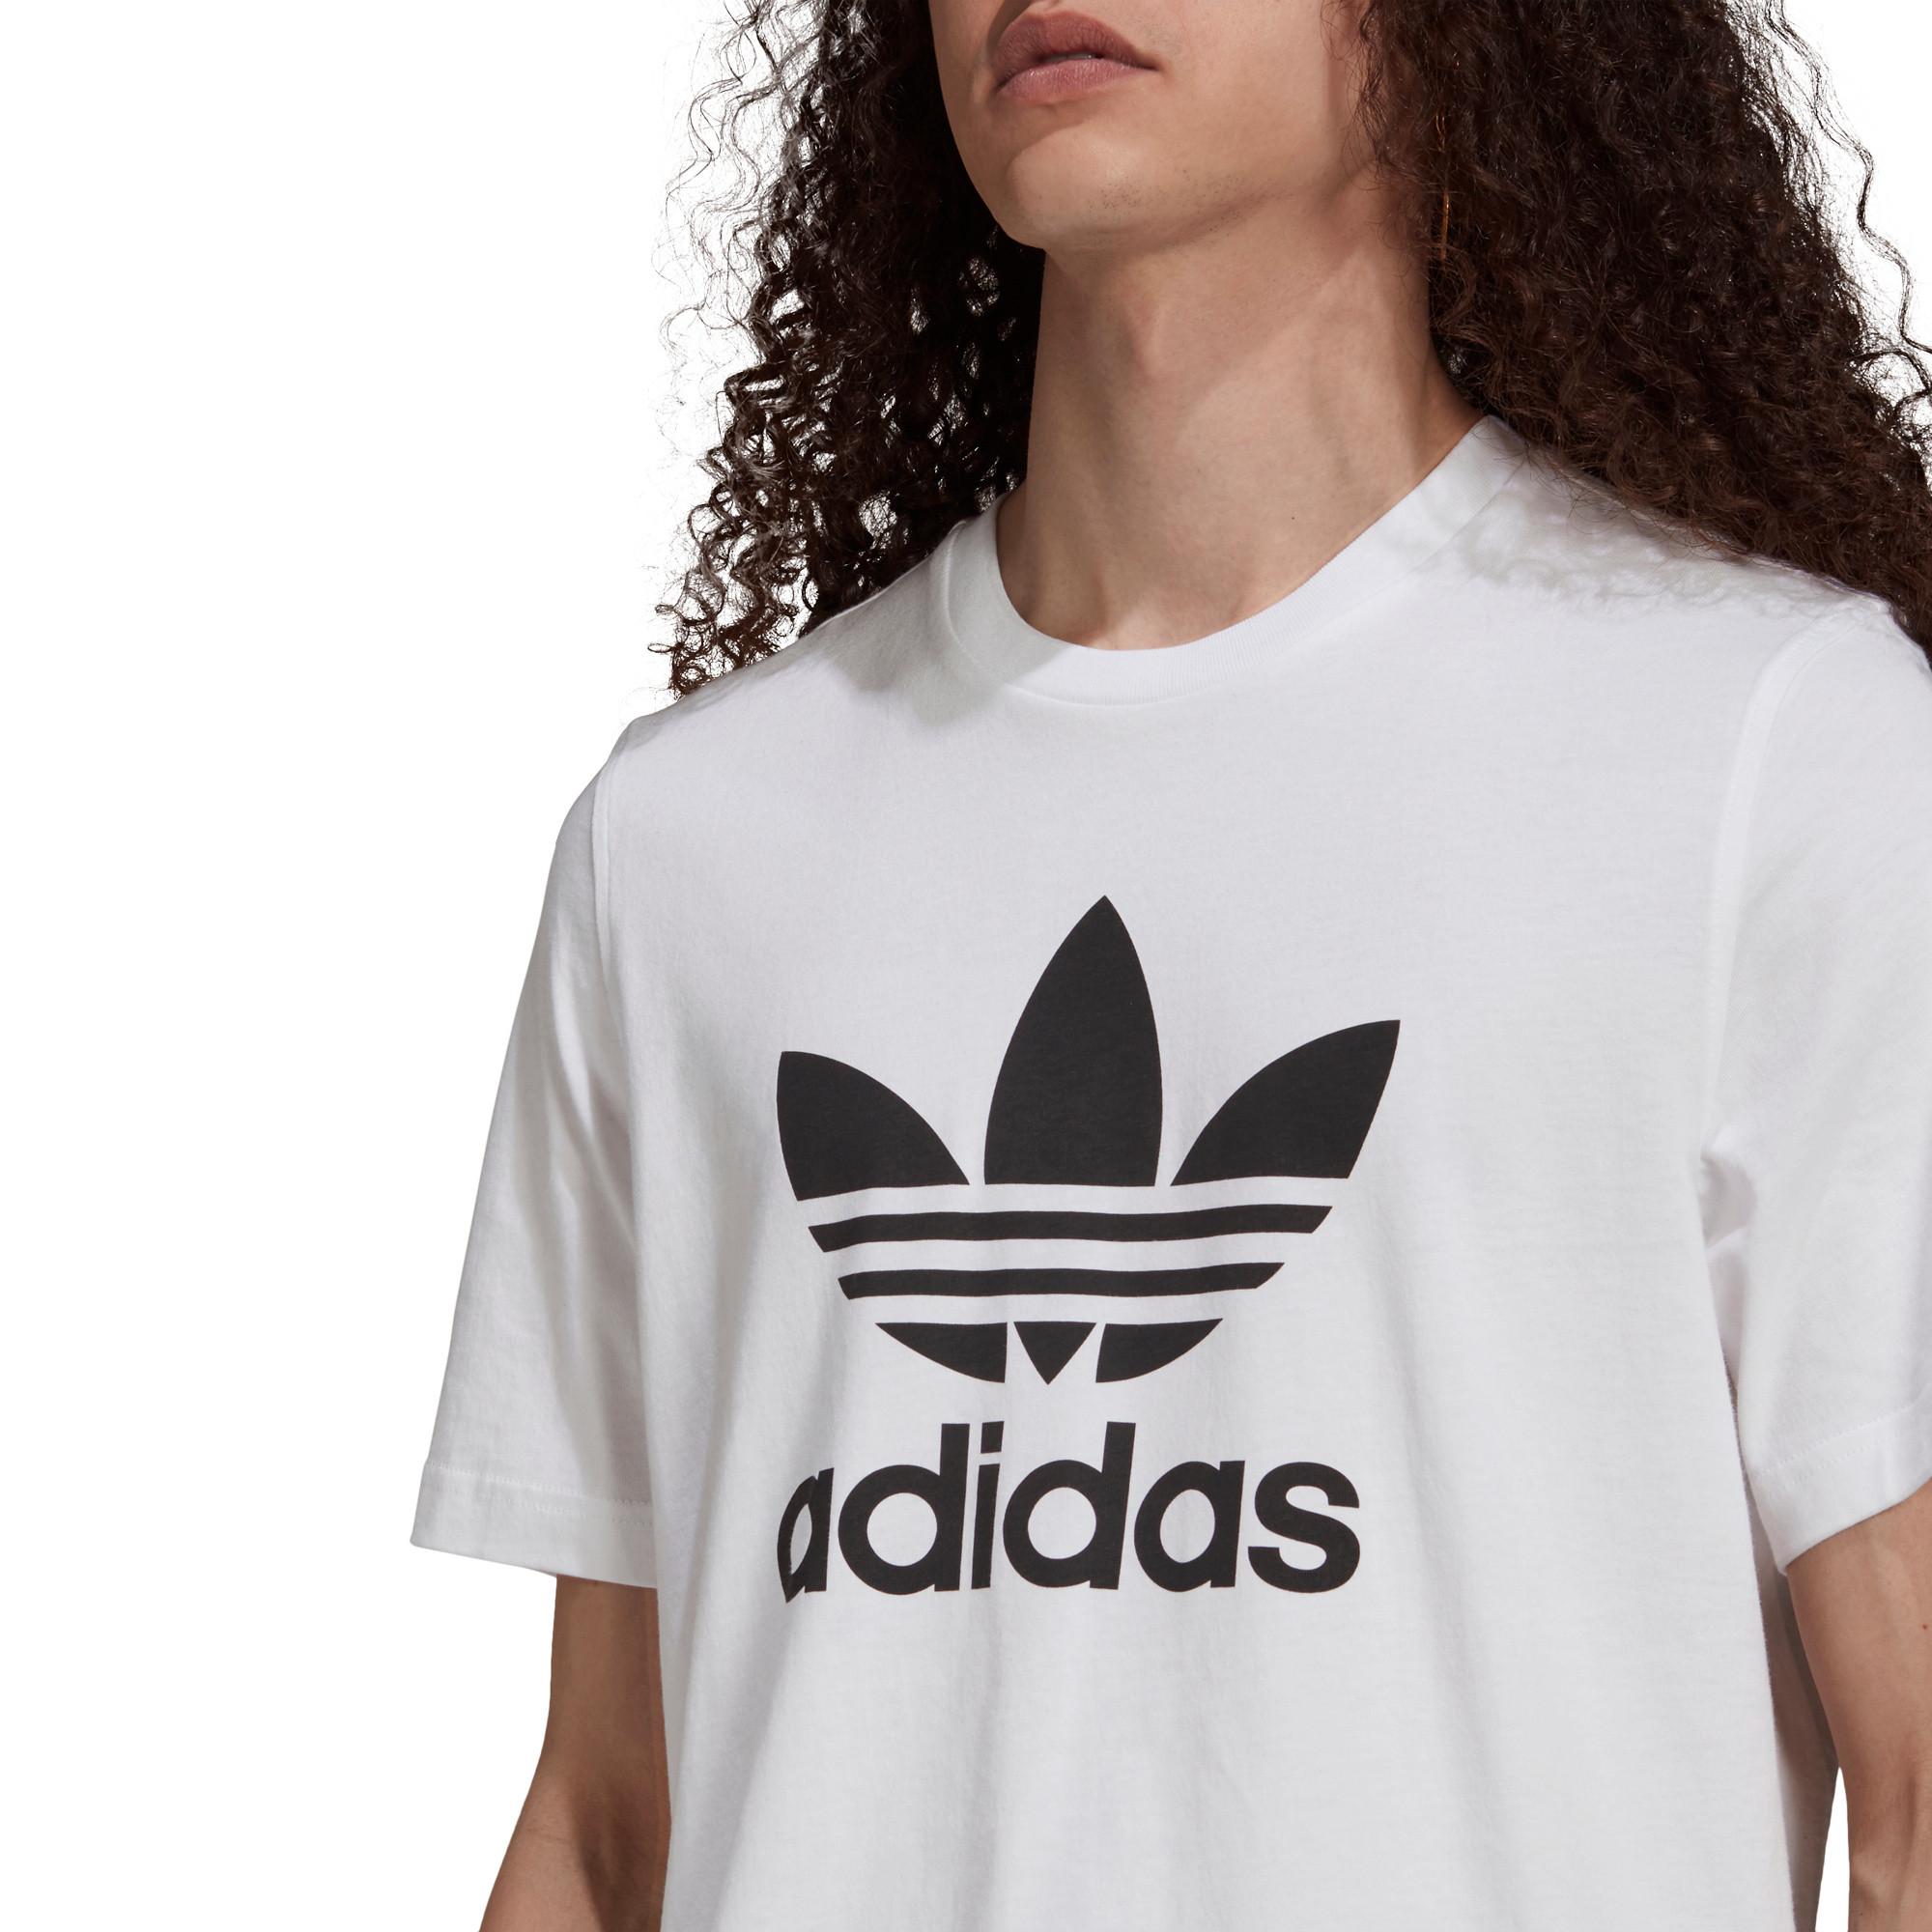 T-shirt uomo adicolor Classics Trefoil, Bianco/Nero, large image number 4